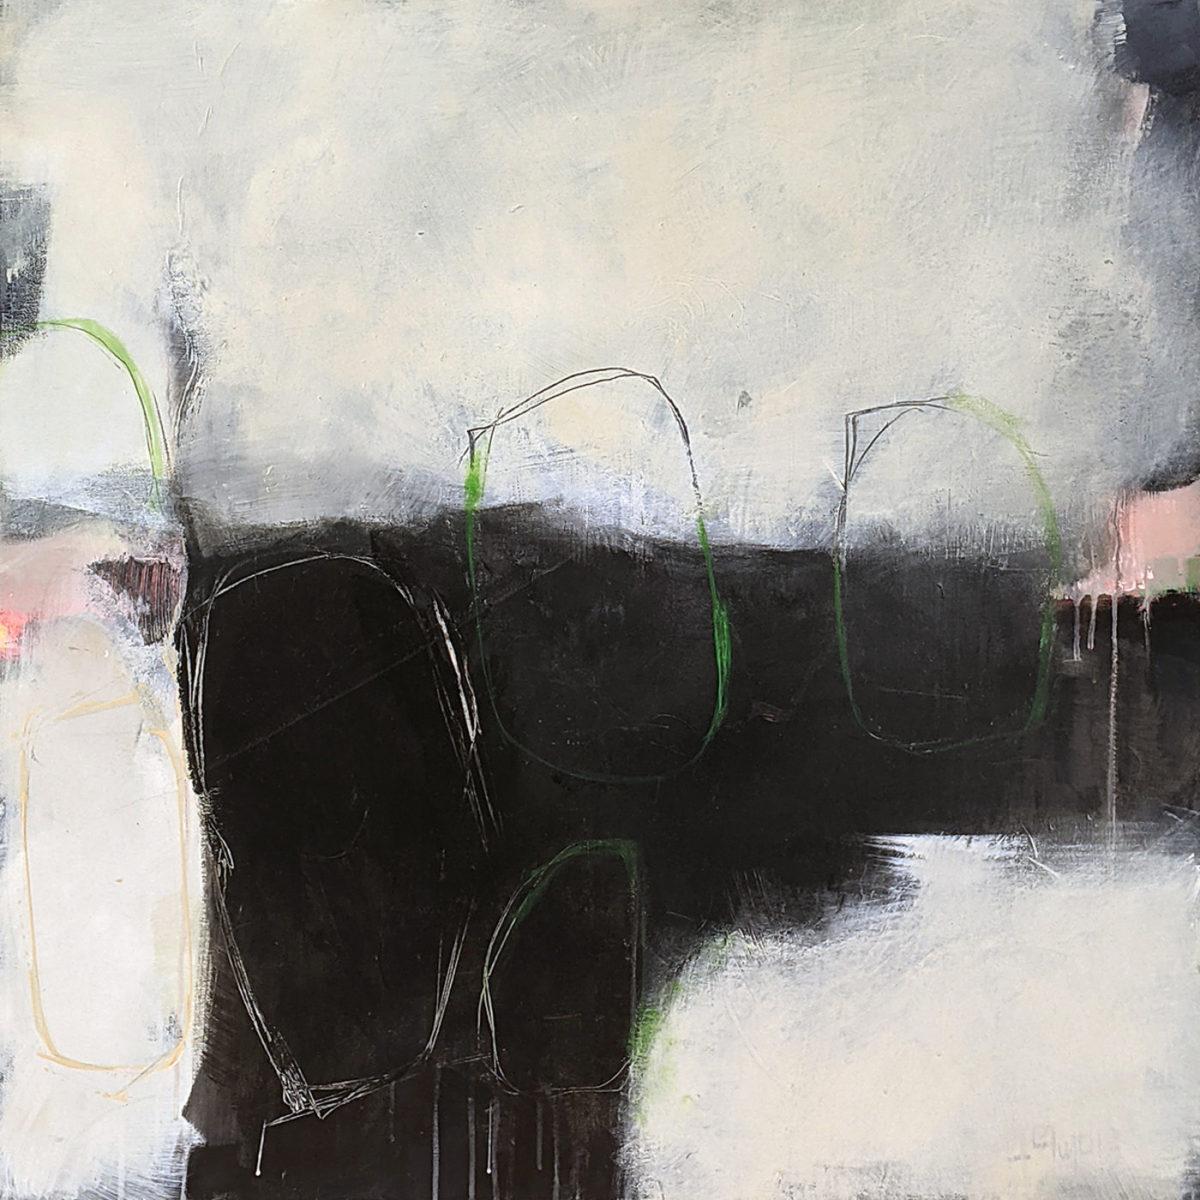 CecilePujol CestPourAujourdHui1 1200x1200, Galerie1809